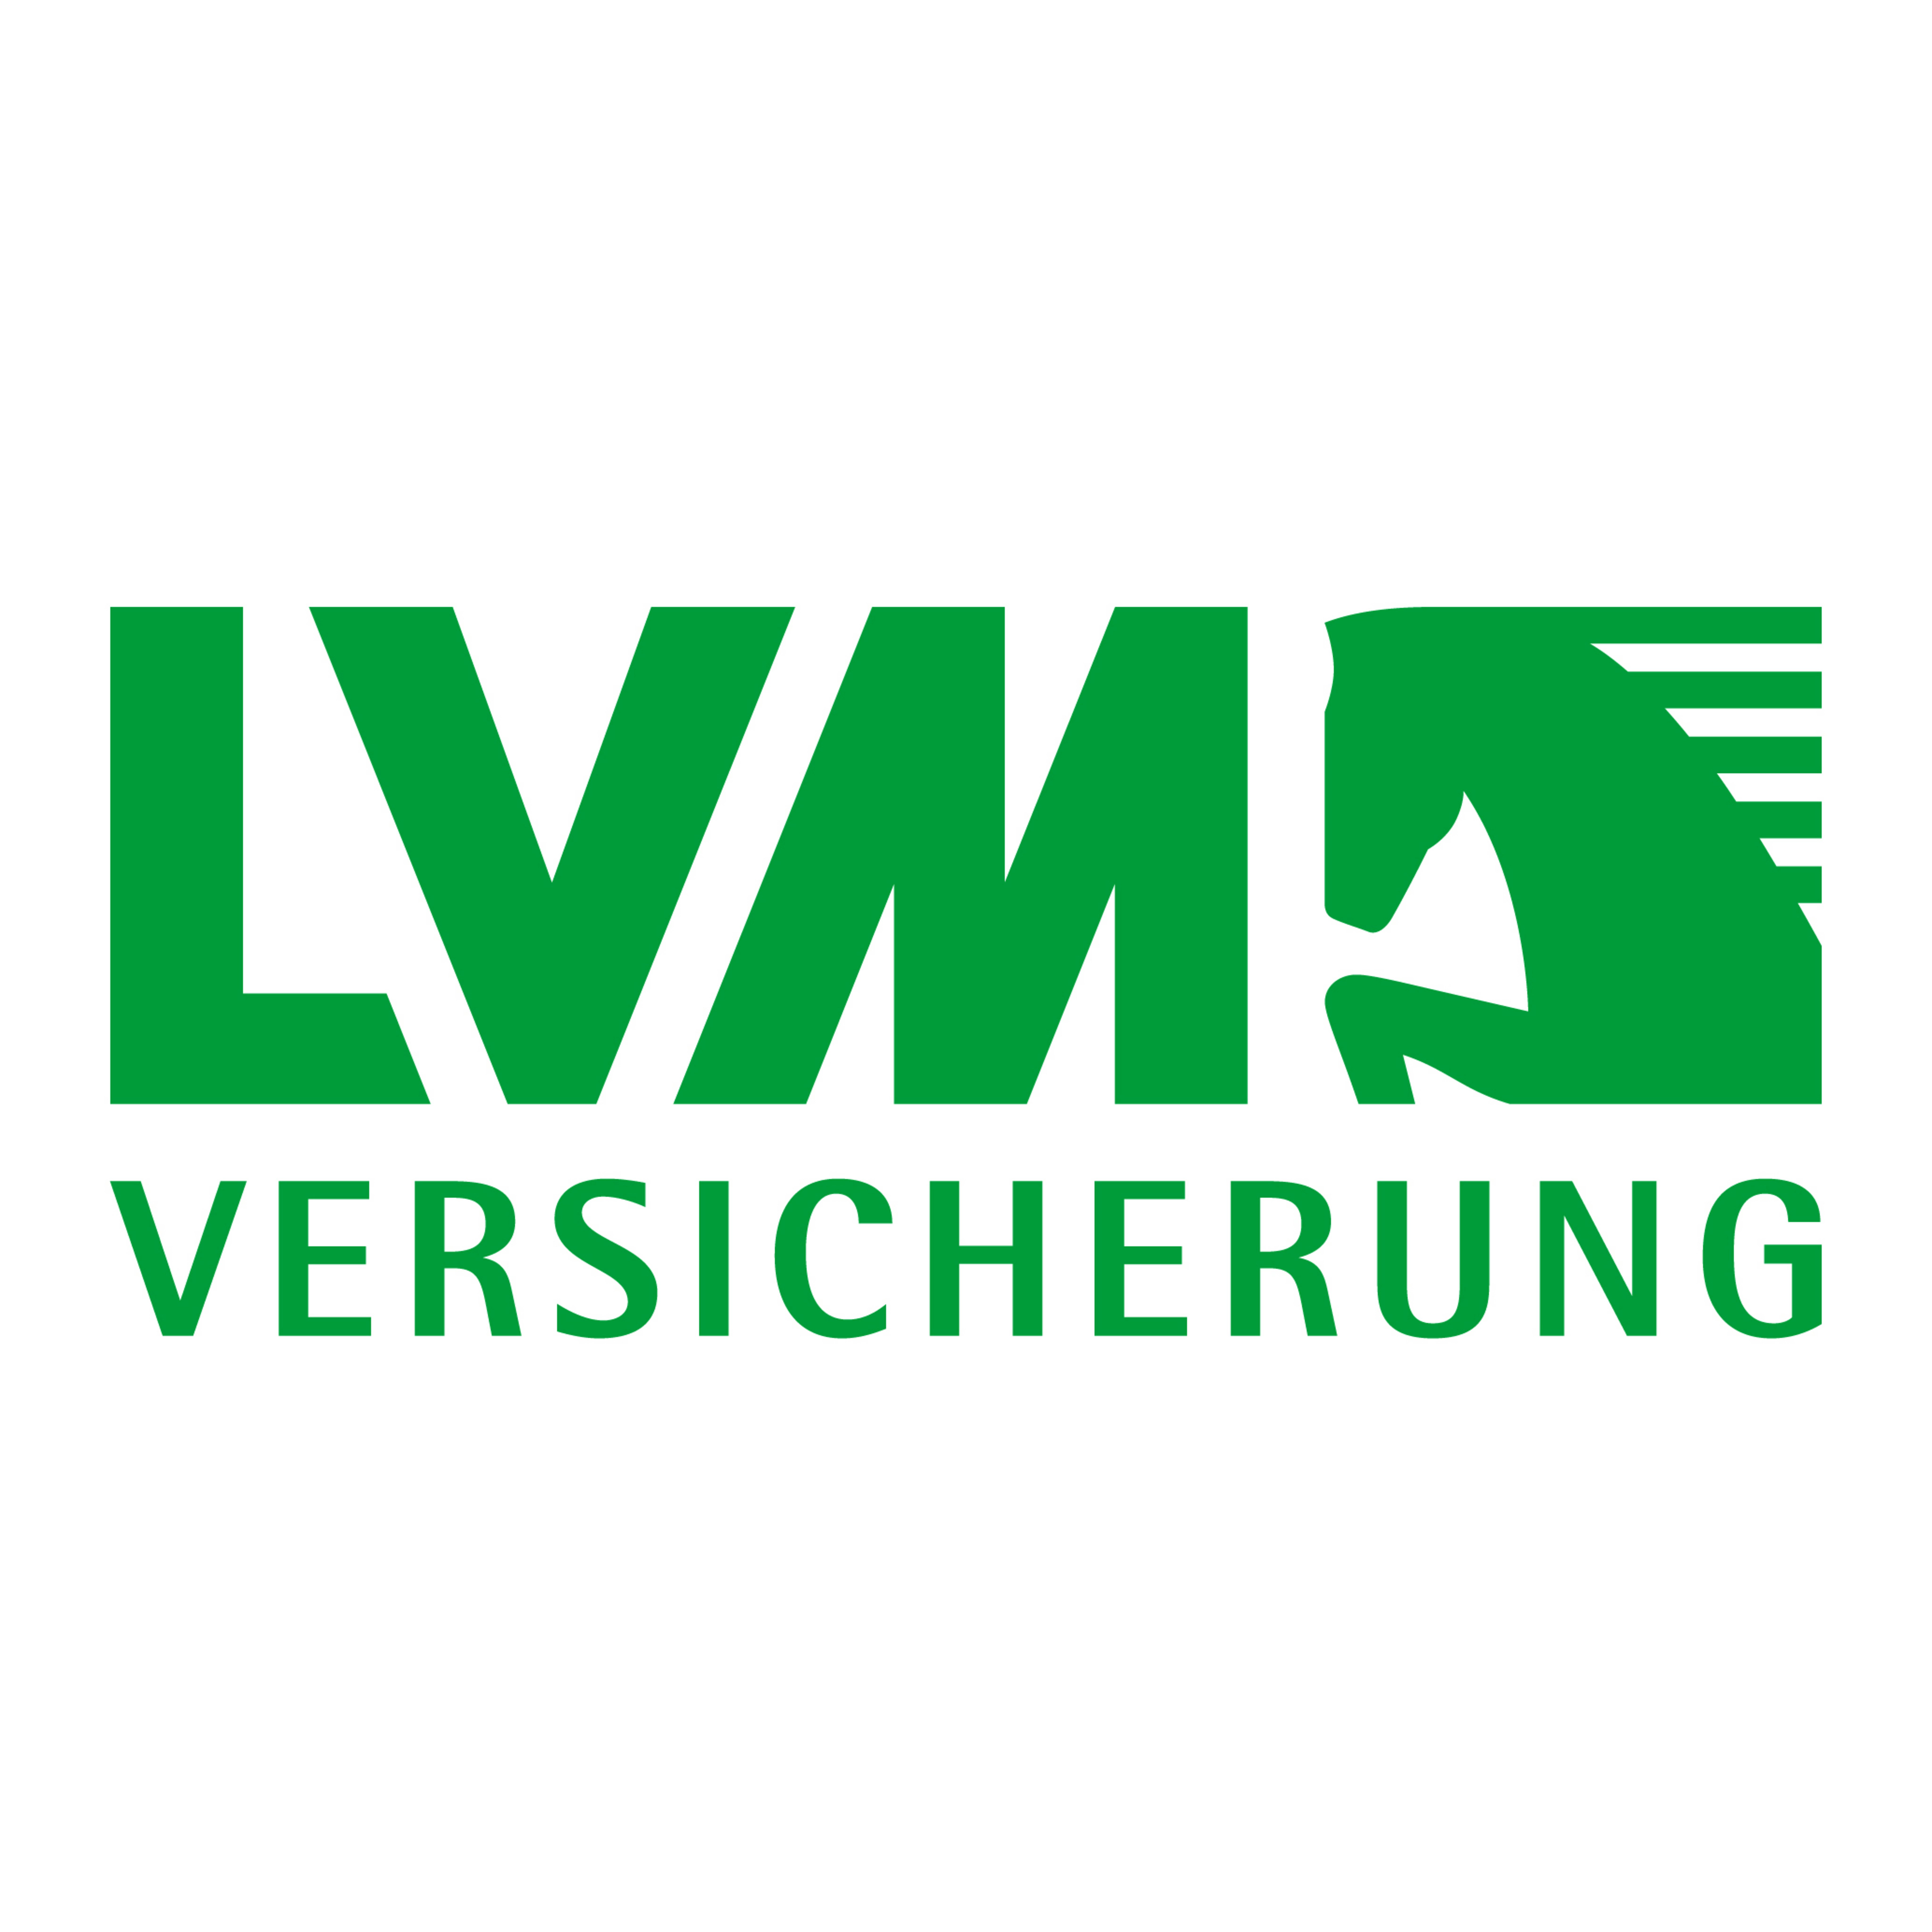 LVM Versicherung Frank Liebig - Versicherungsagentur